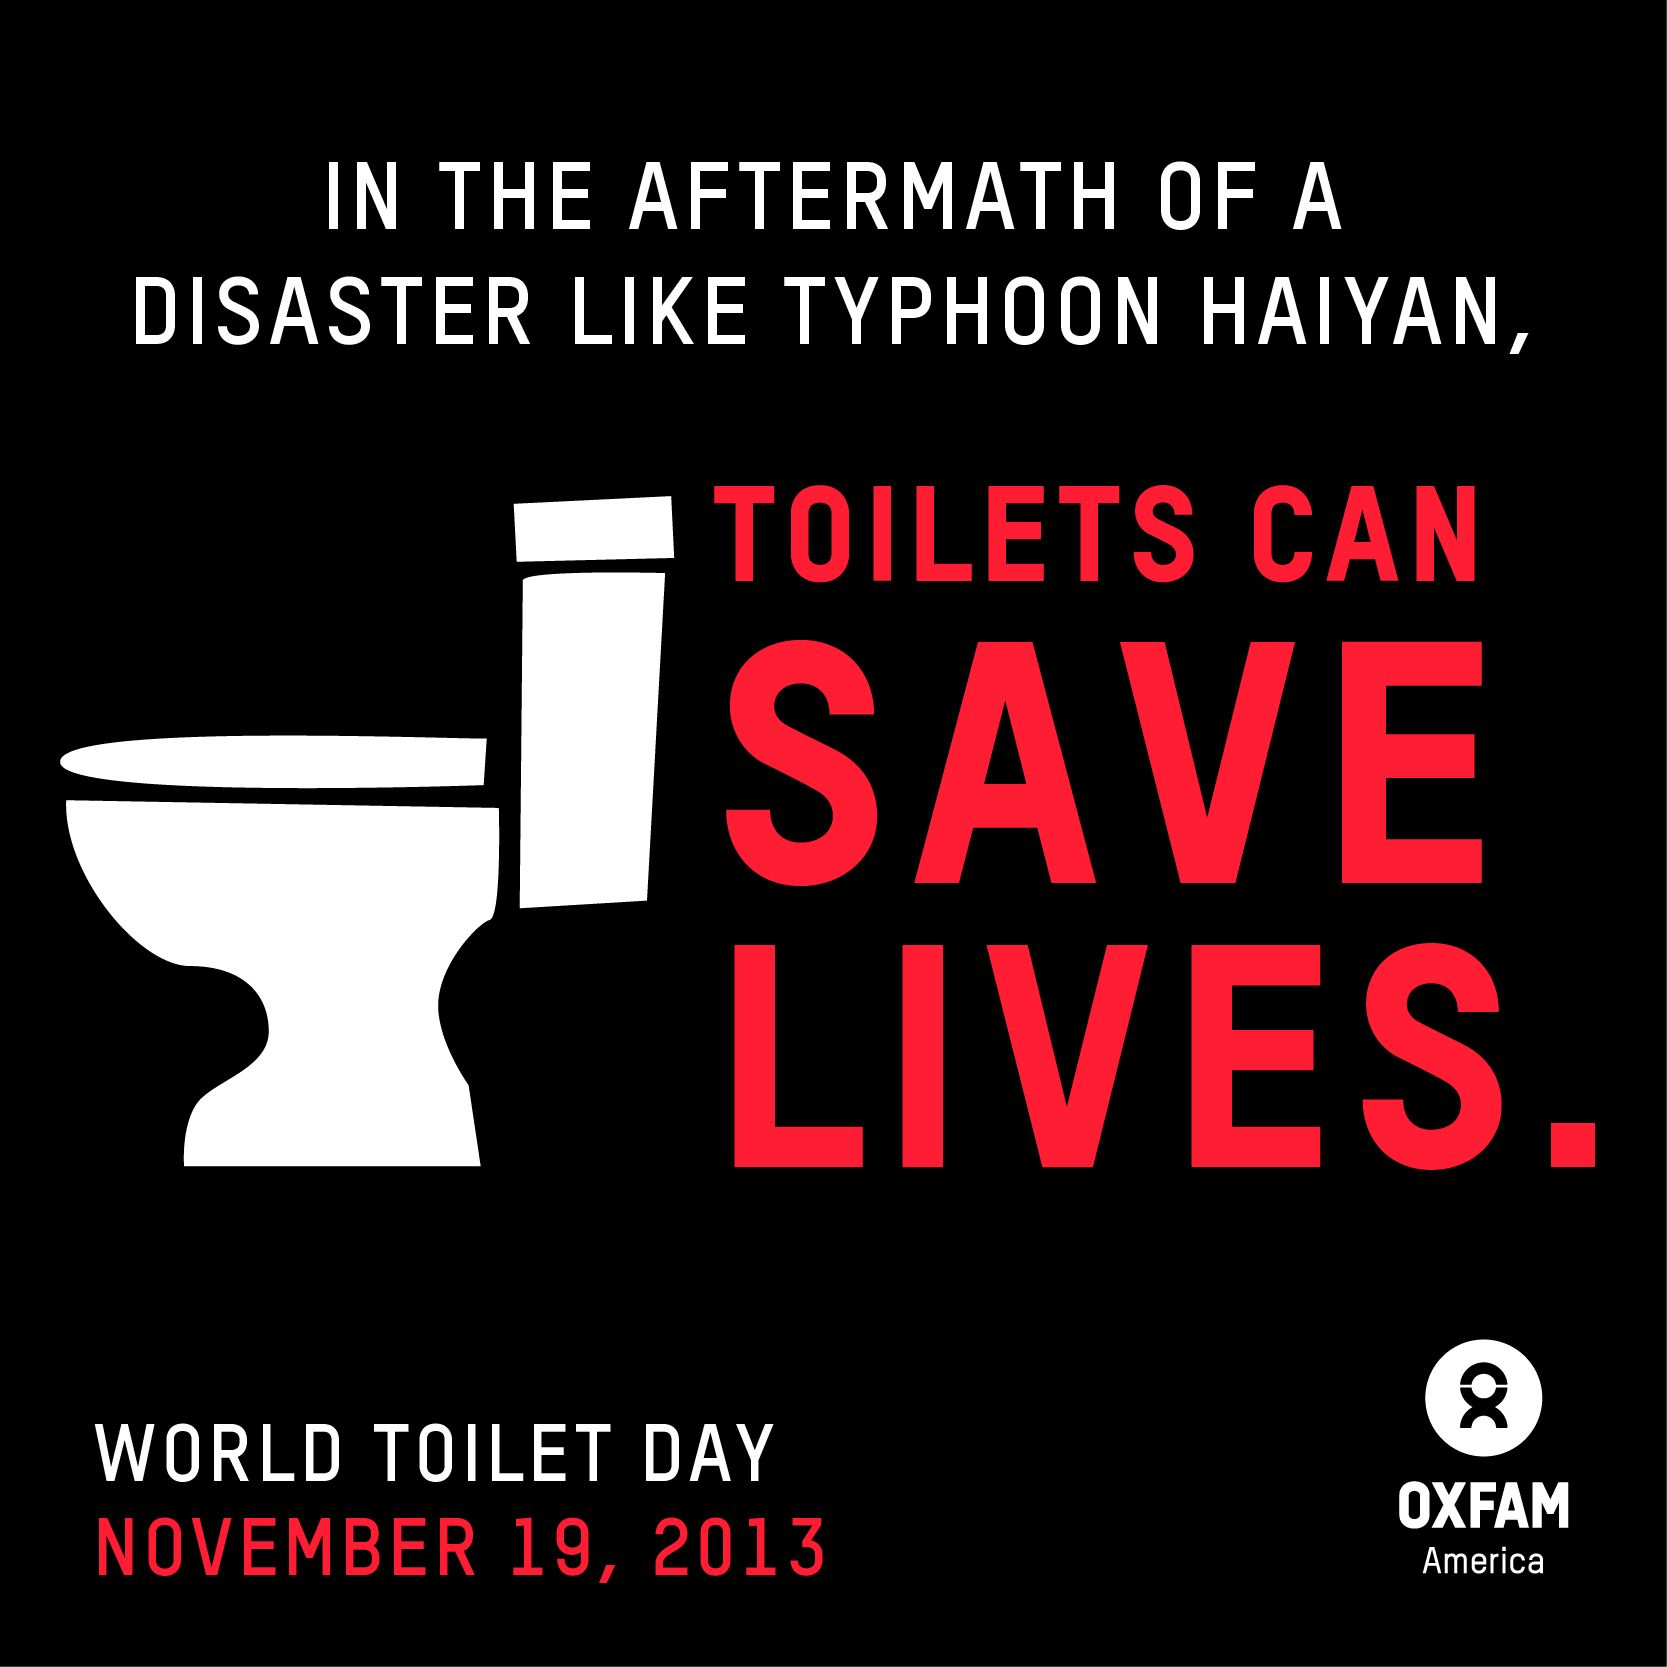 11-19-2013 #WorldToiletDay